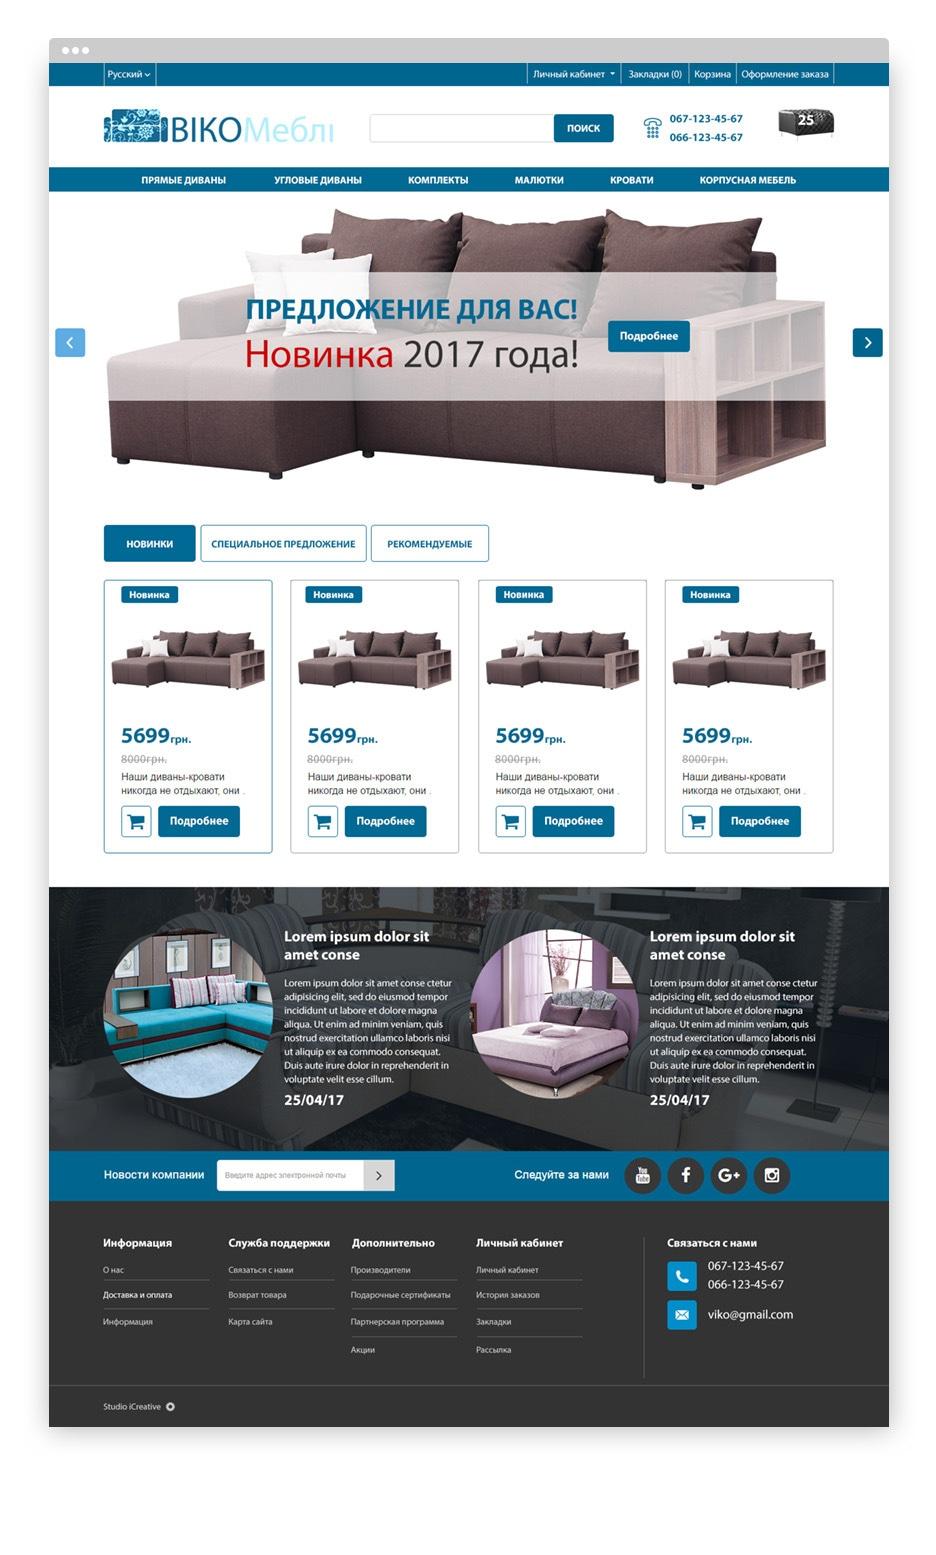 icreative.com.ua_viko_1